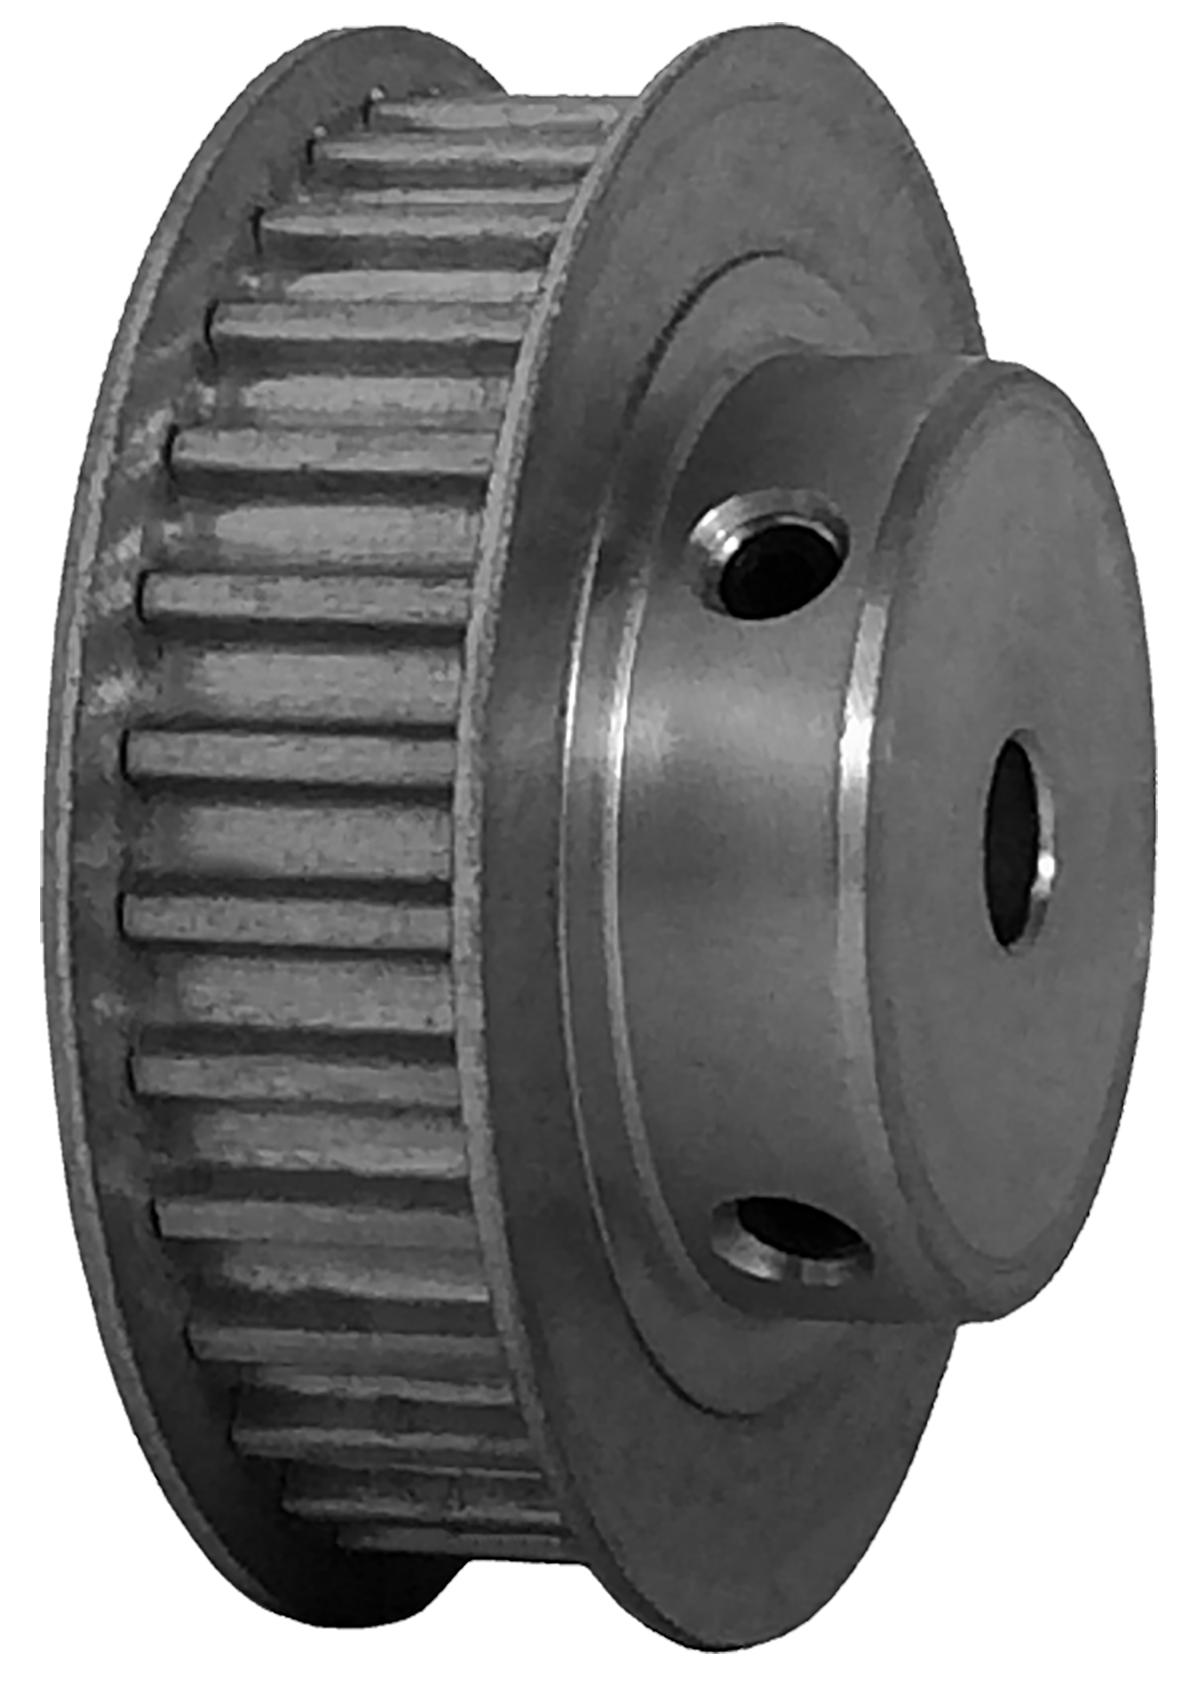 30-5M09-6FA3 - Aluminum Powerhouse®HTD® Pulleys